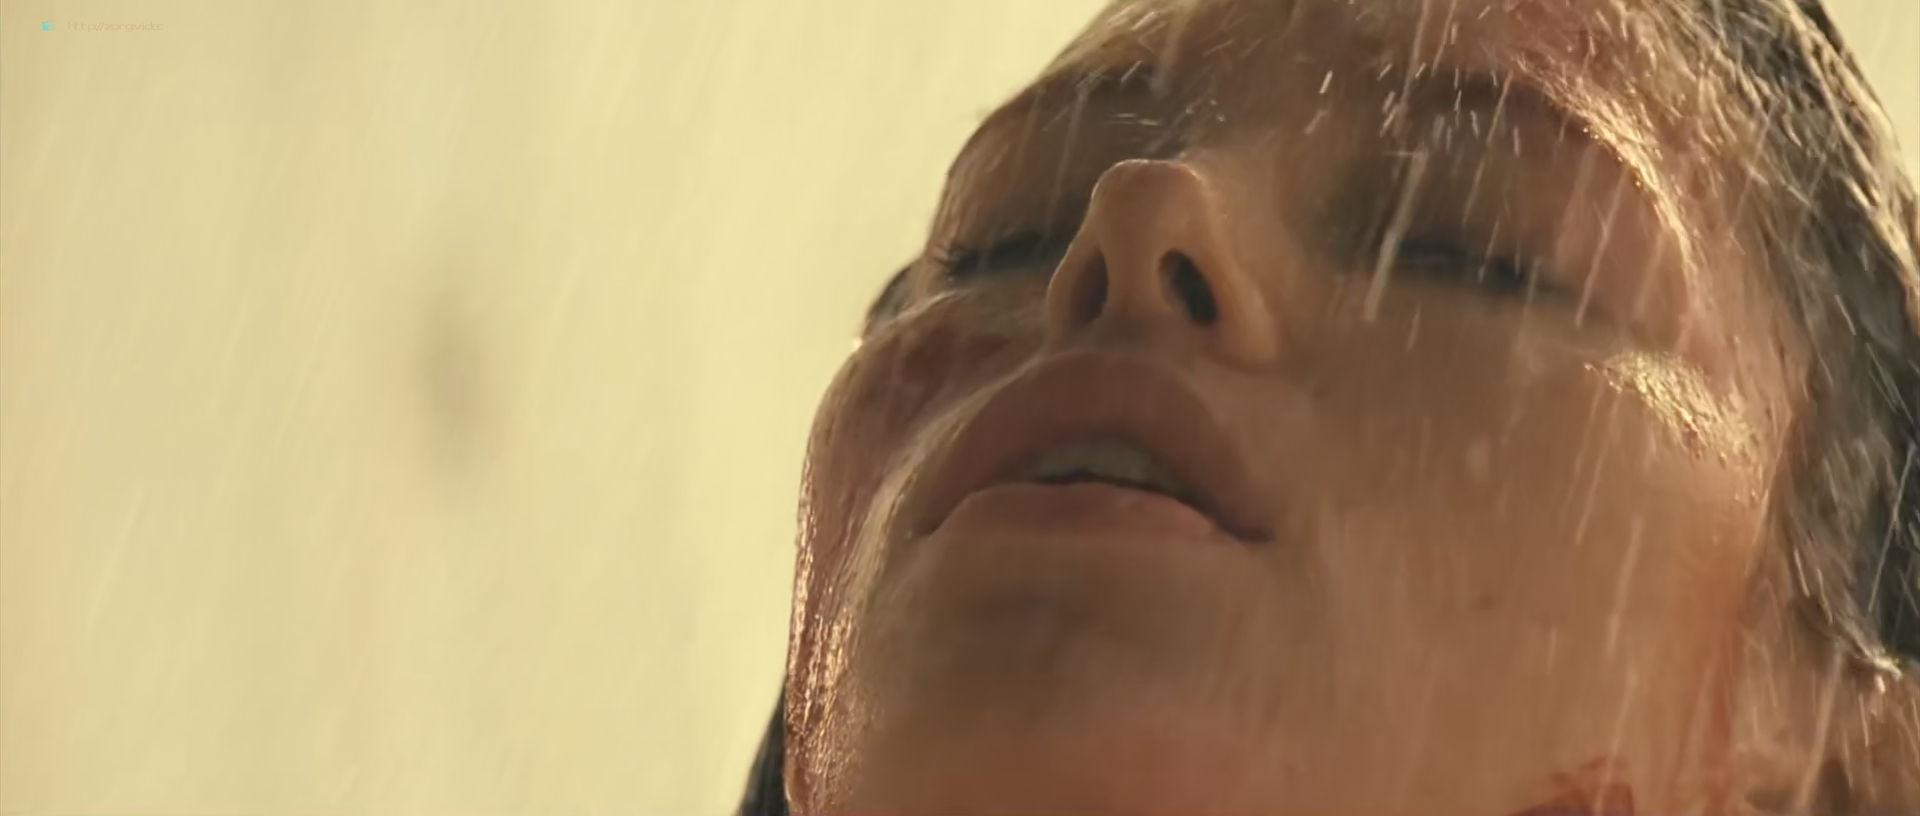 Jessica Biel hot and sexy - Blade Trinity (2004) HD 1080p BluRay (14)